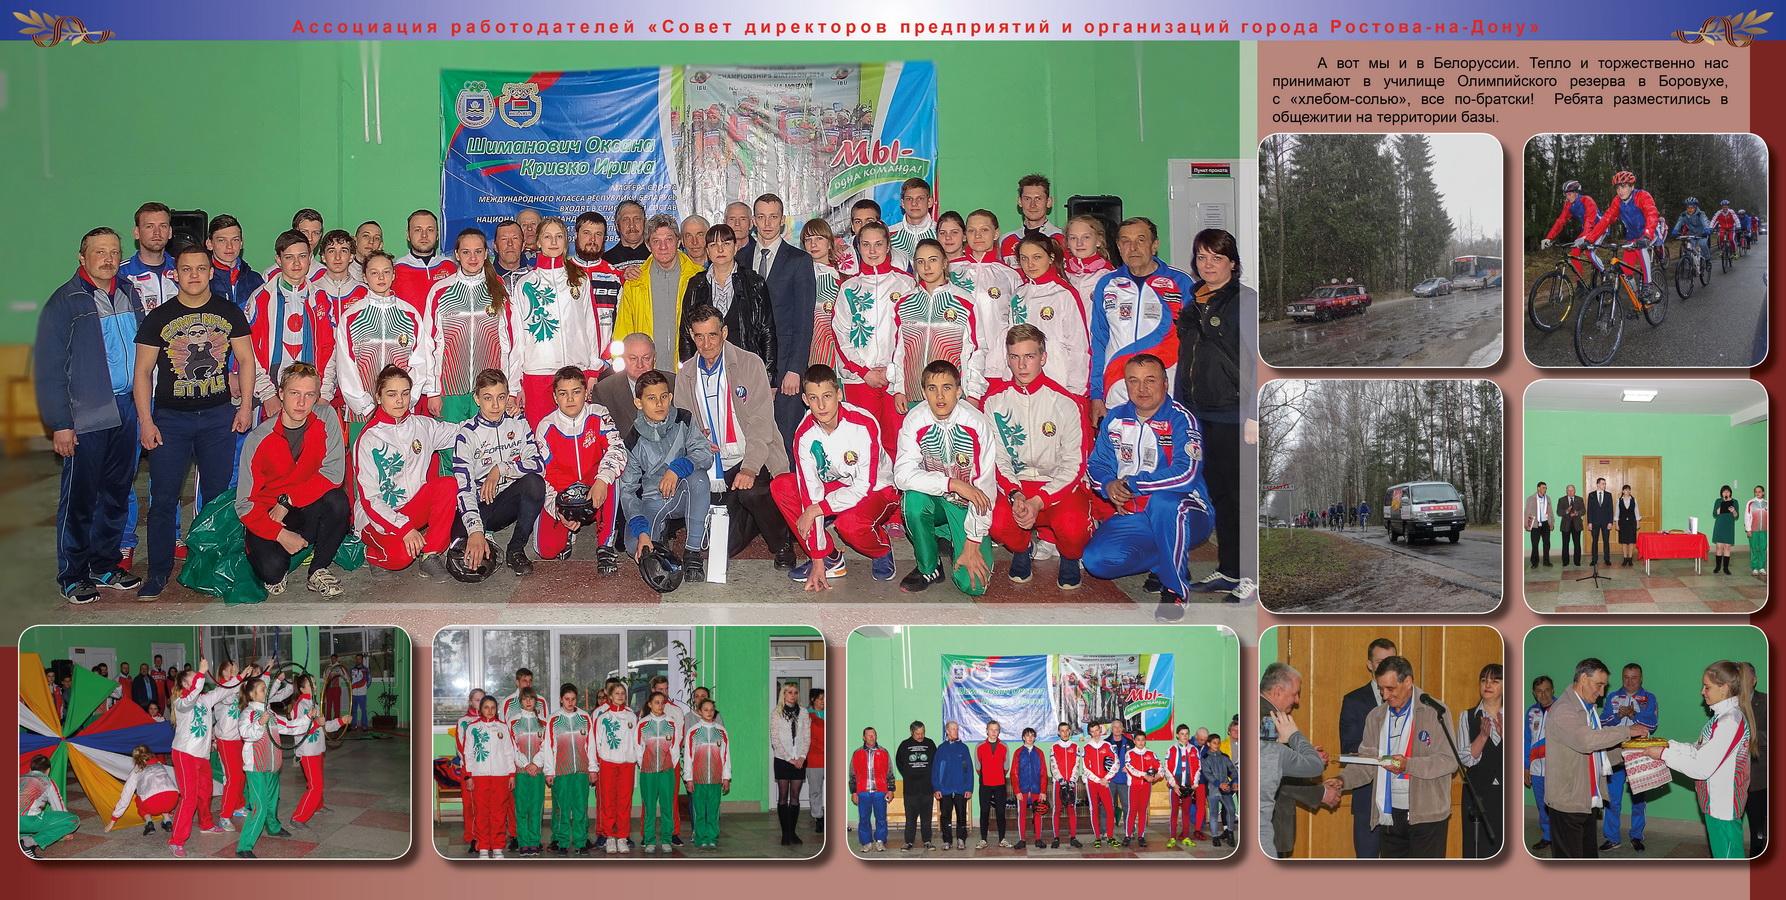 Велопробег 2017 Фотокнига_2_504х254_22 разворот белоруссия 1